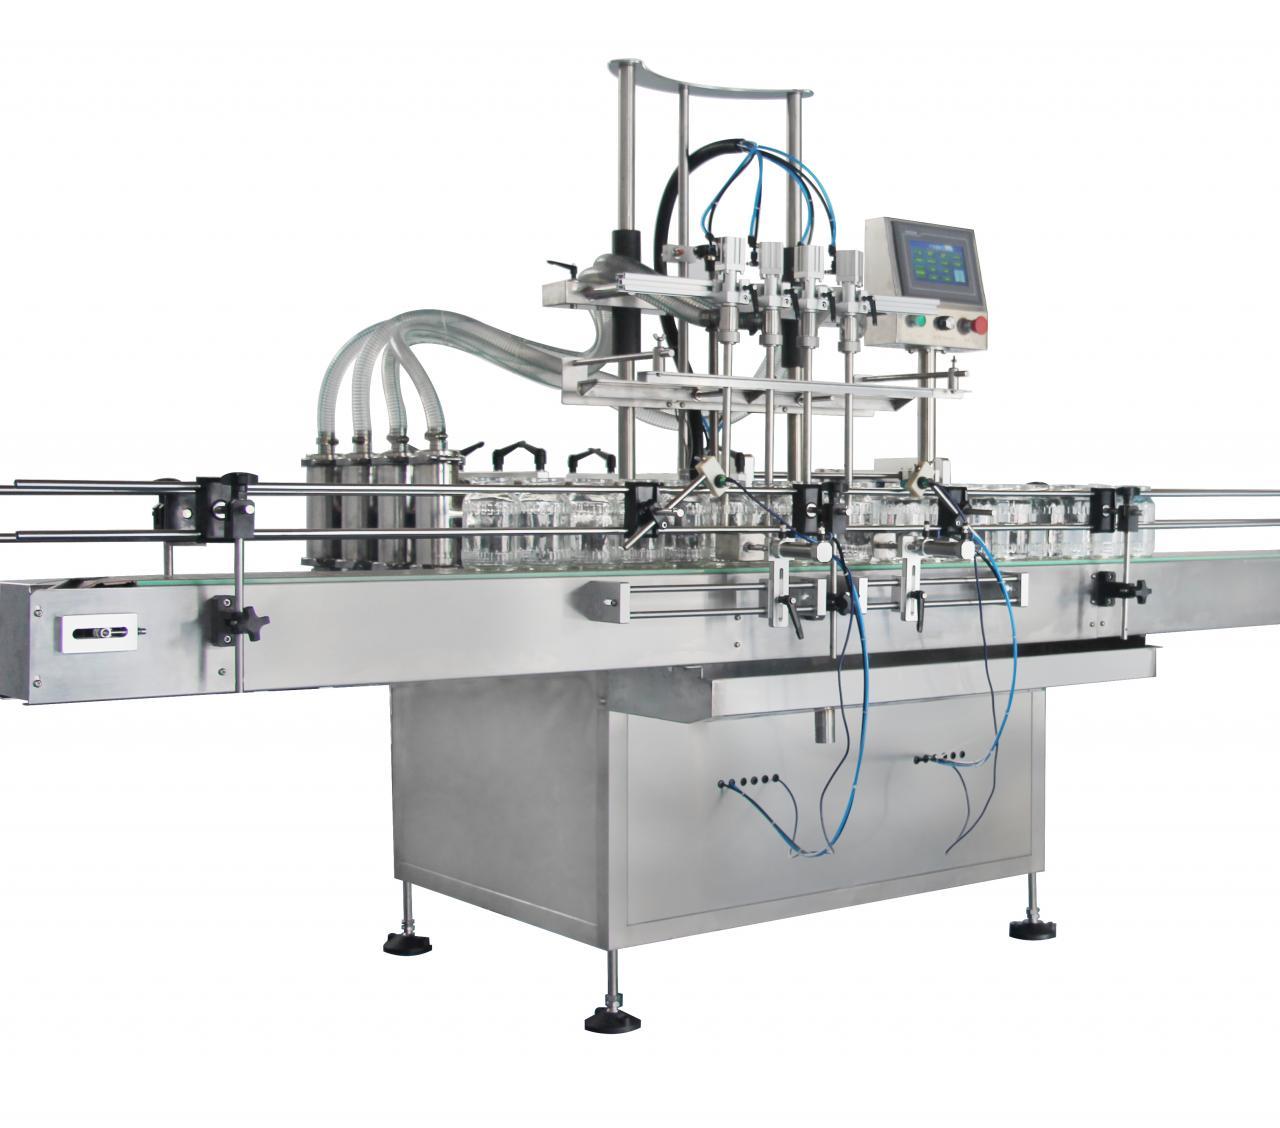 Npack Easy Operate 100ml-1l Economic Servo Motor Driven Efficient Automatic Ink Filling Machine for Bottle